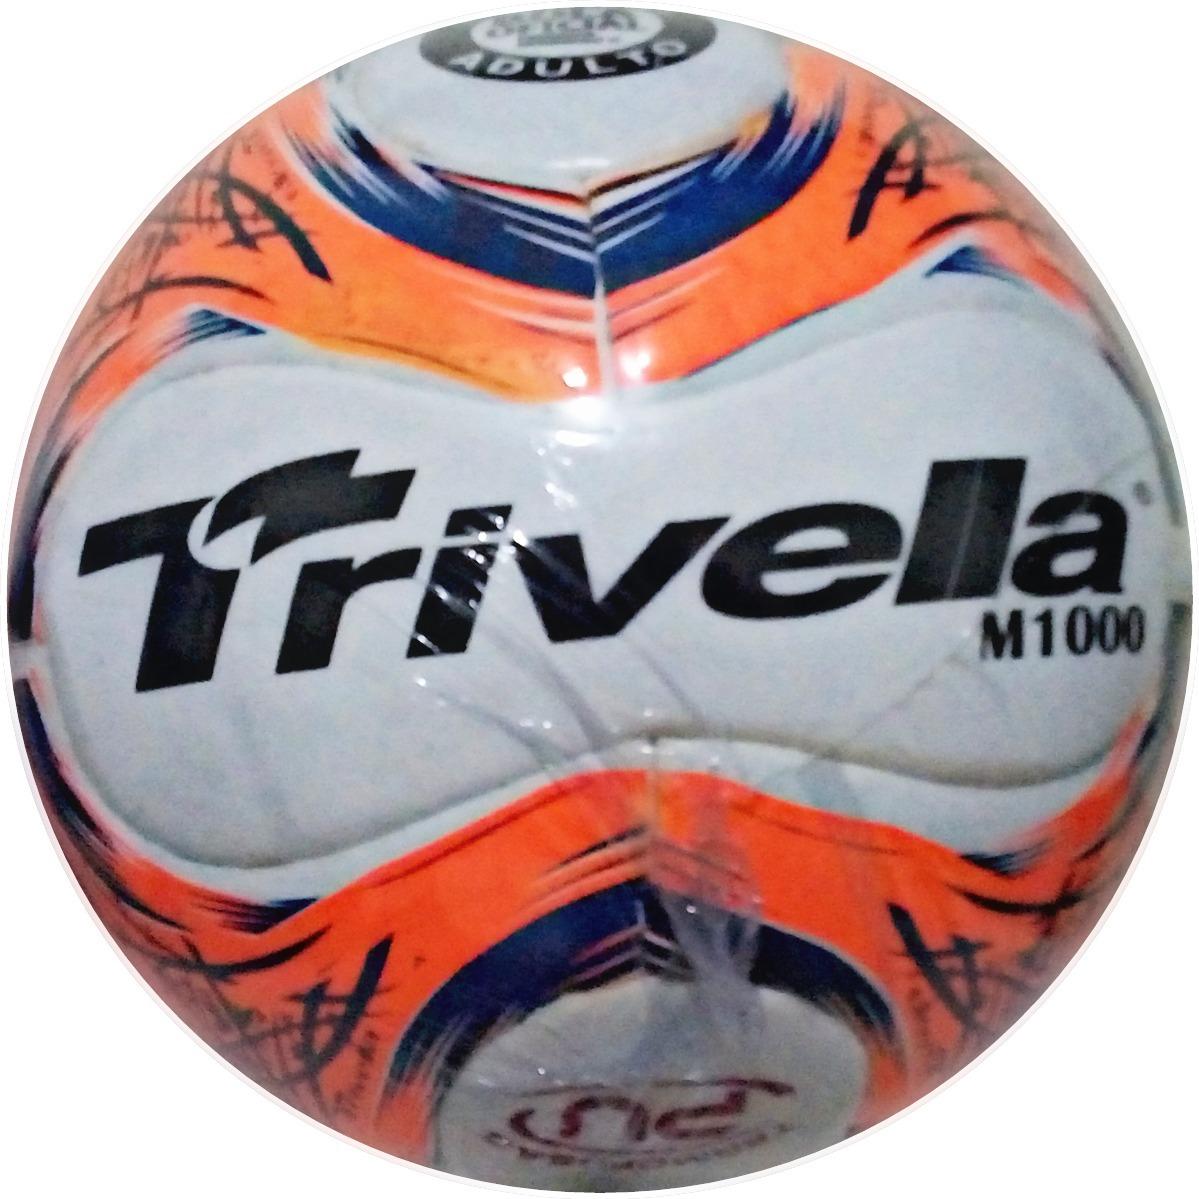 d87dce2321 Bola Futebol Futsal Trivella Original Promoção - Brasil Gold - R  60 ...